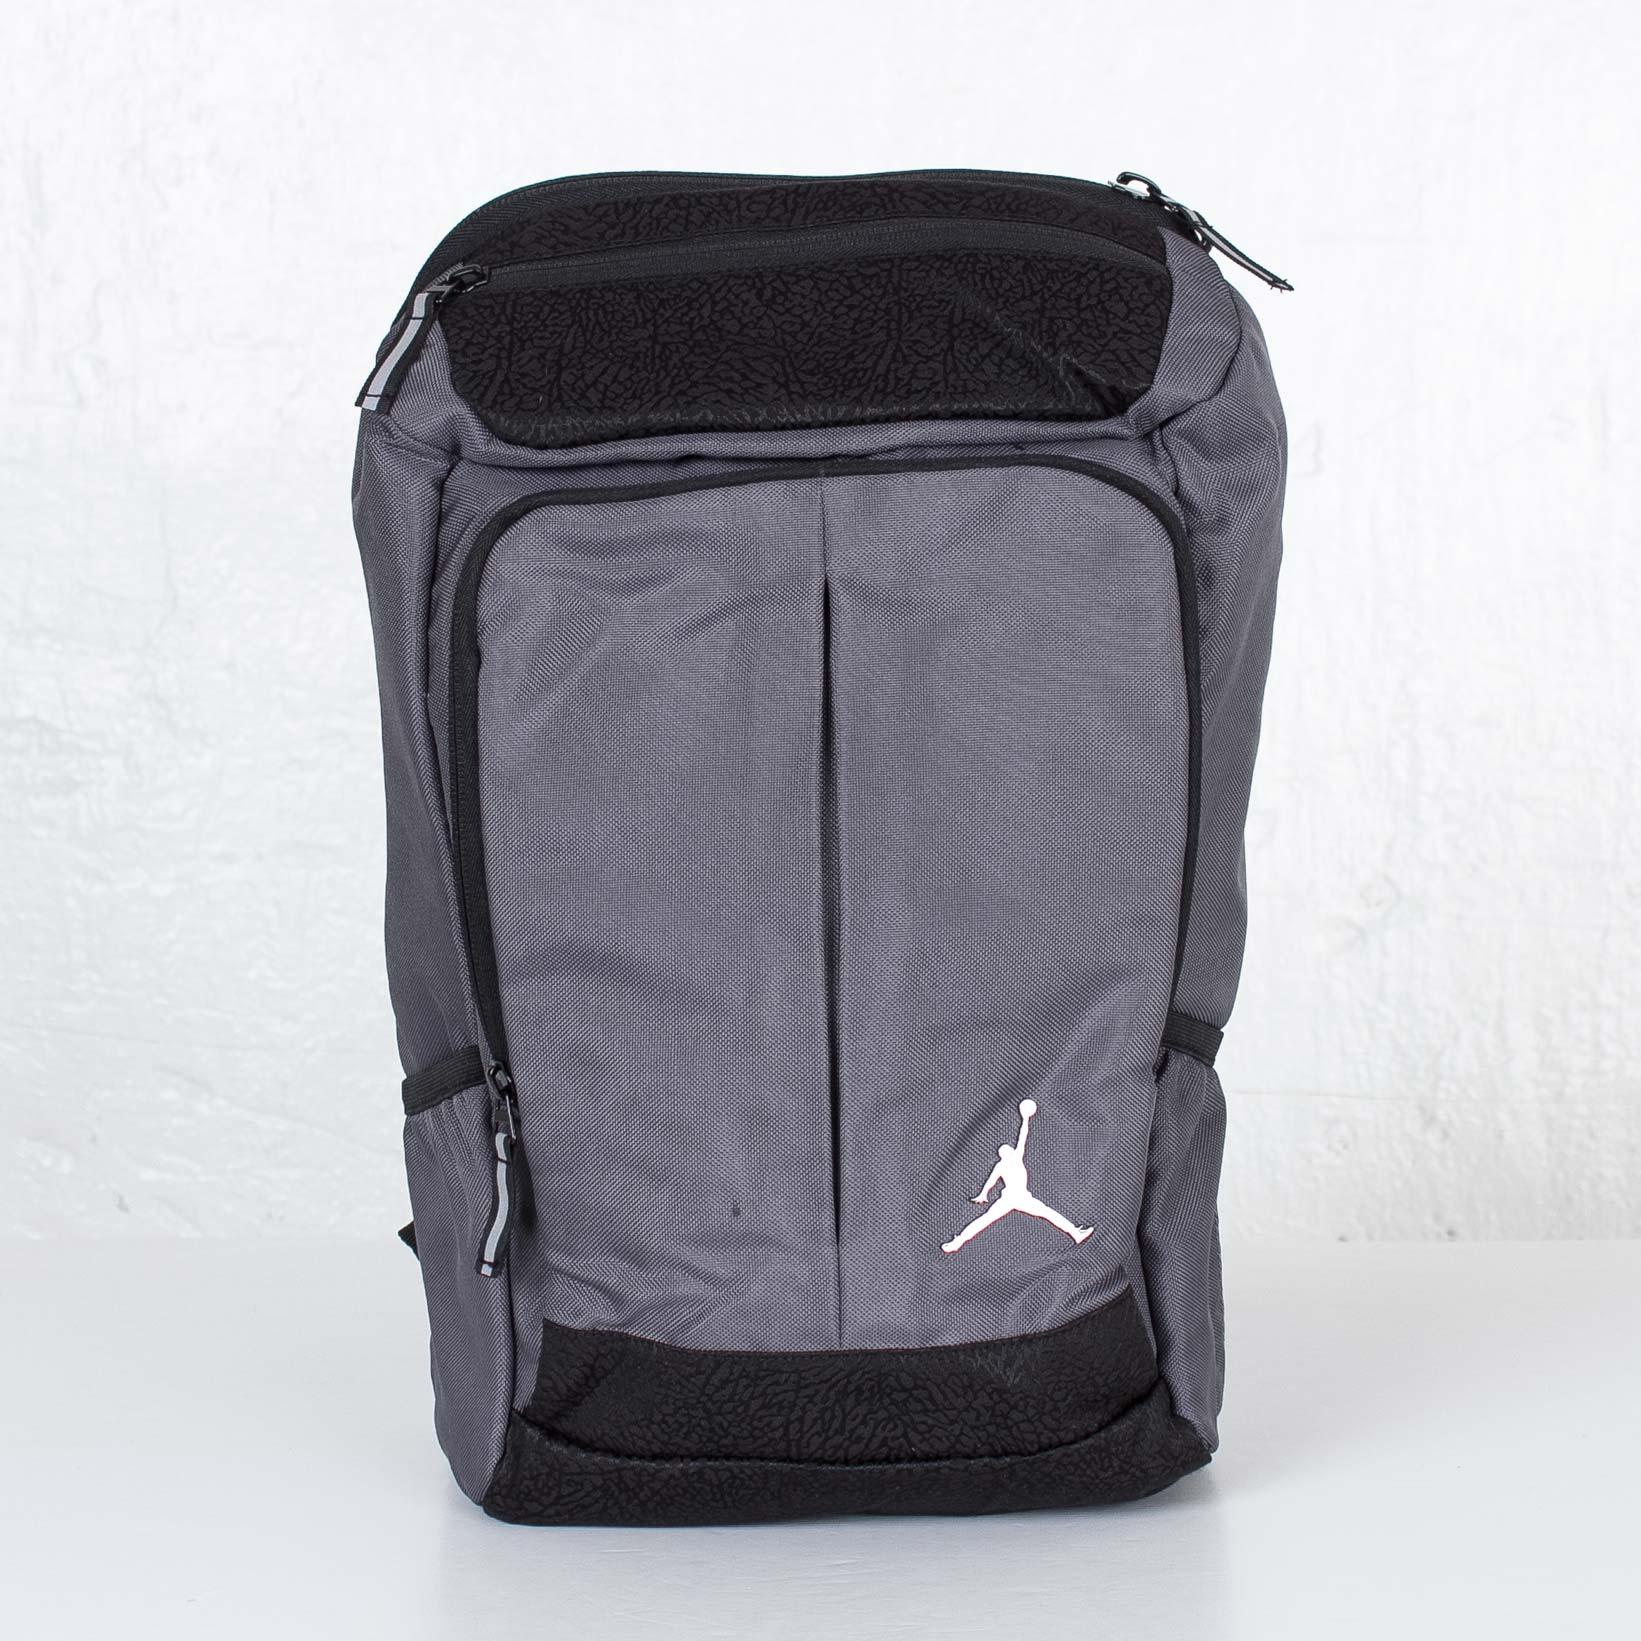 250f5c0f901 Jordan Brand Unconscious Pack - 9a1687-195 - Sneakersnstuff ...